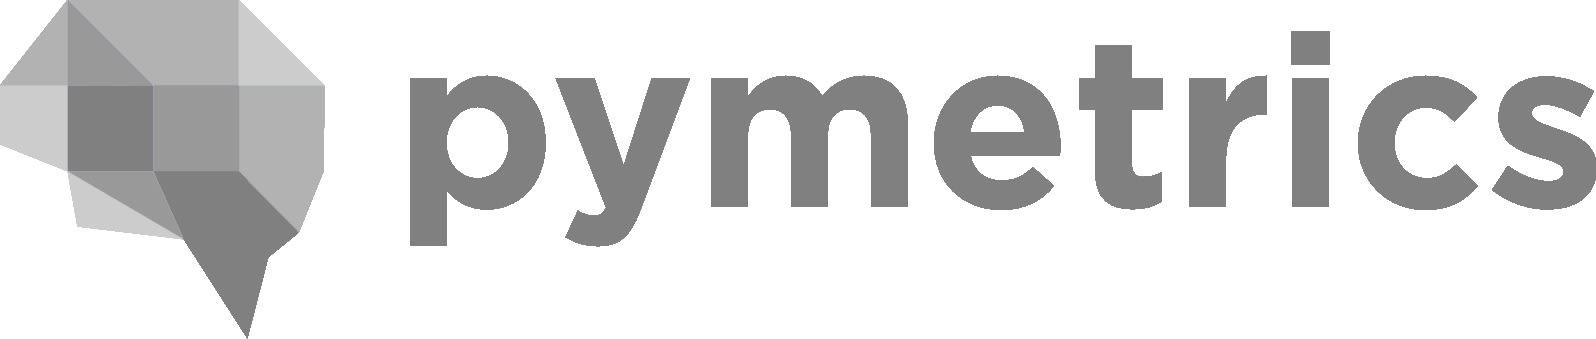 Pymetrics_logo